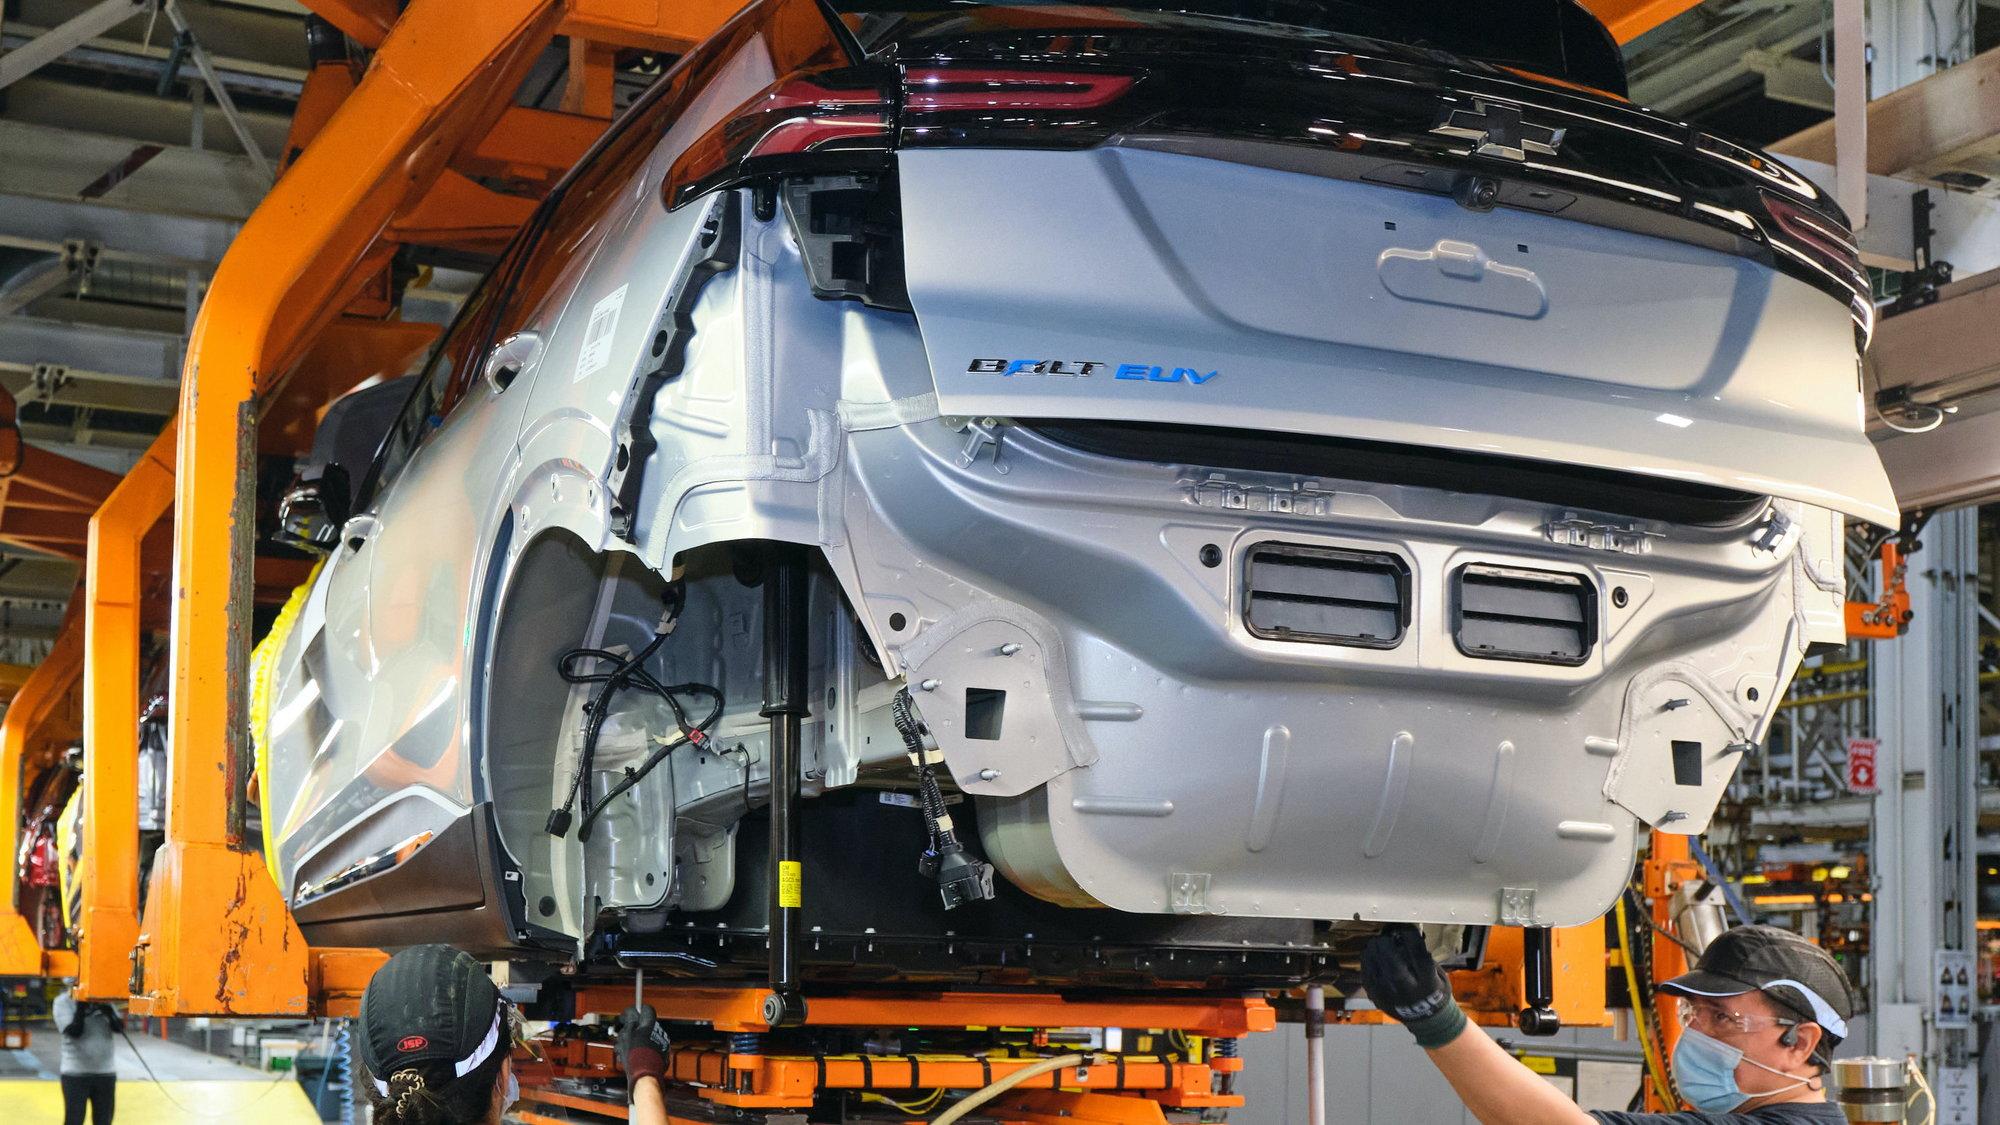 2022 Bolt EV assembly - battery marriage